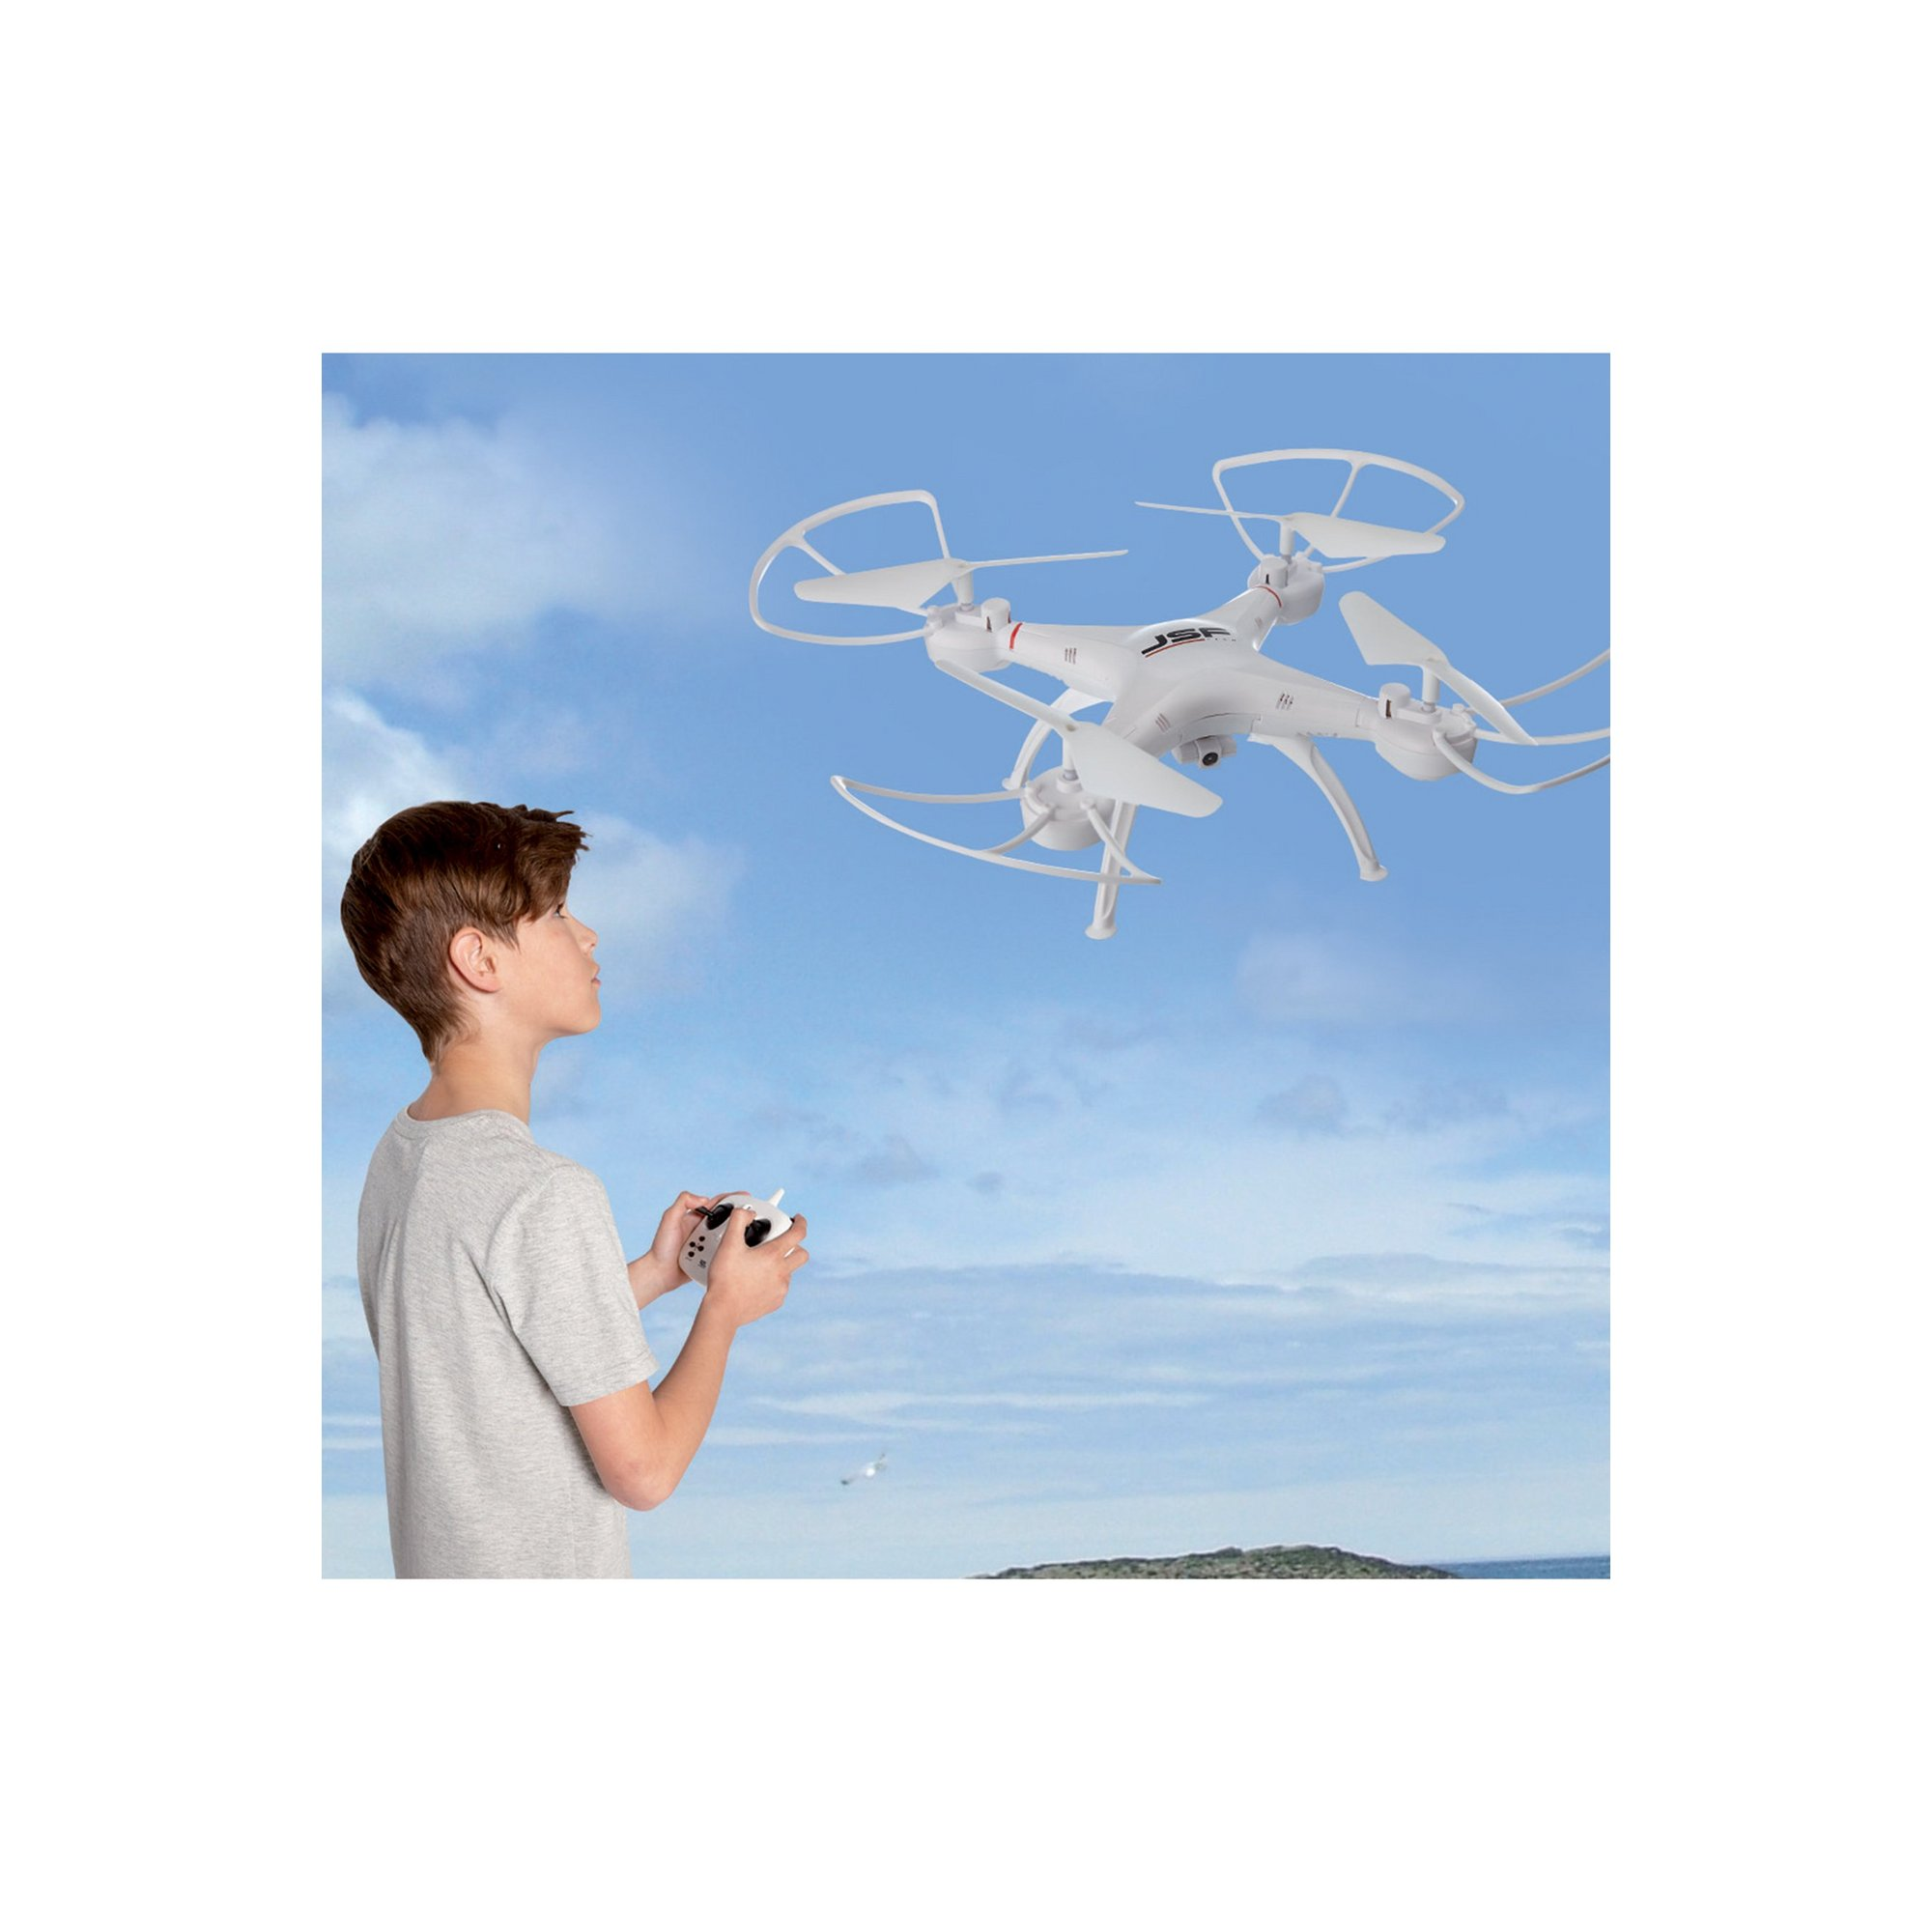 Hawk Quadcopter Drone with Camera